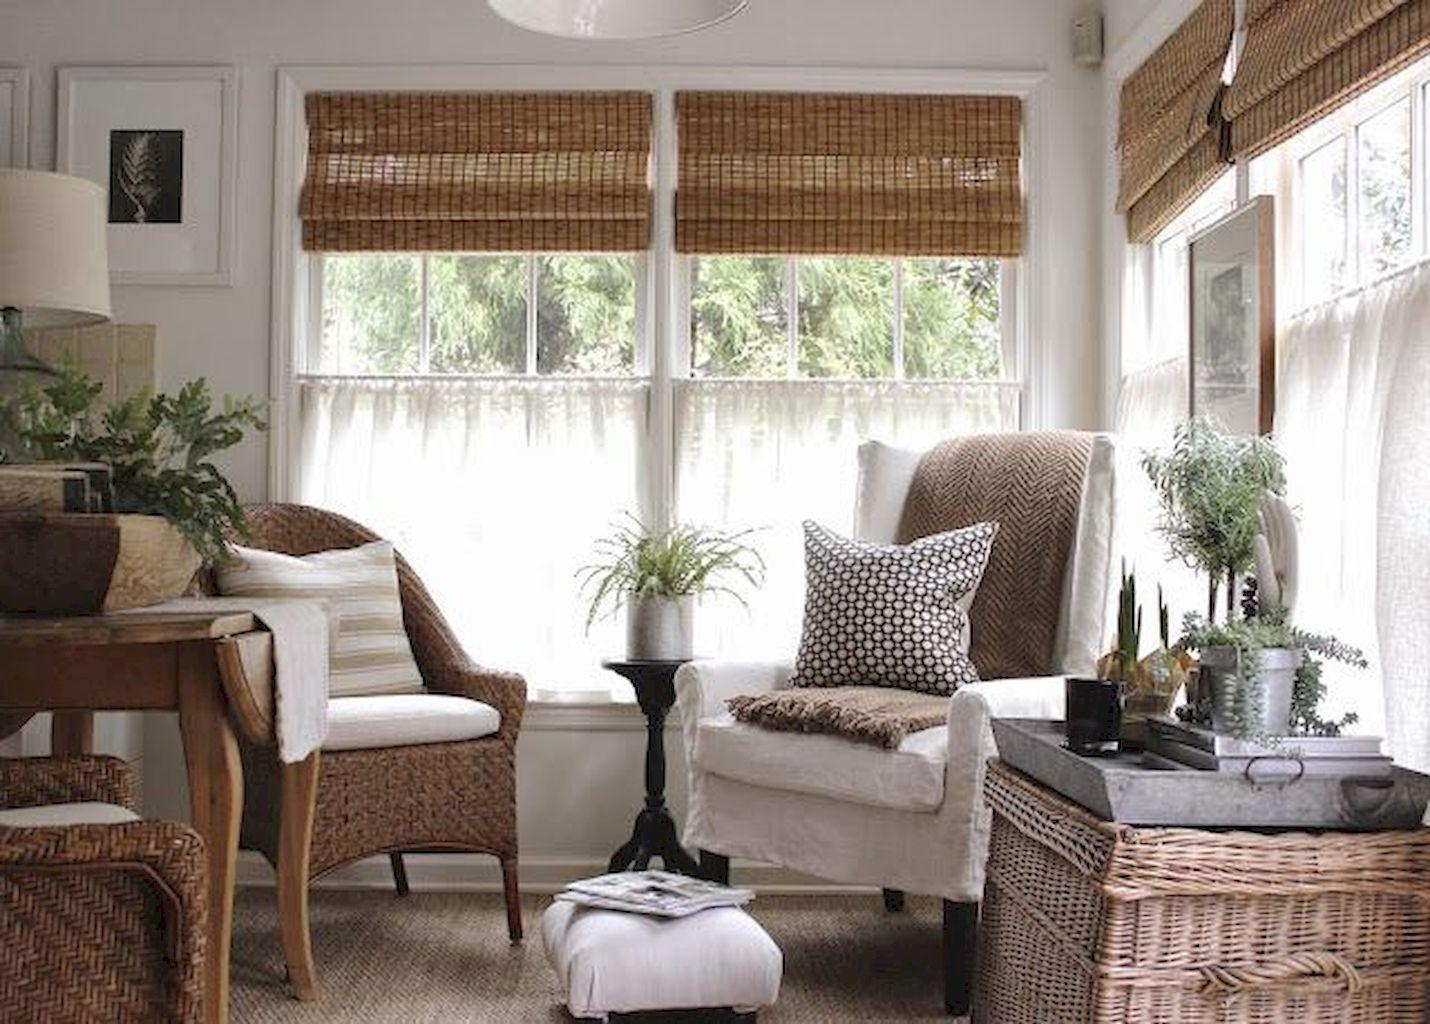 Window ideas for a sunroom   cozy modern farmhouse sunroom designs  home decor  pinterest